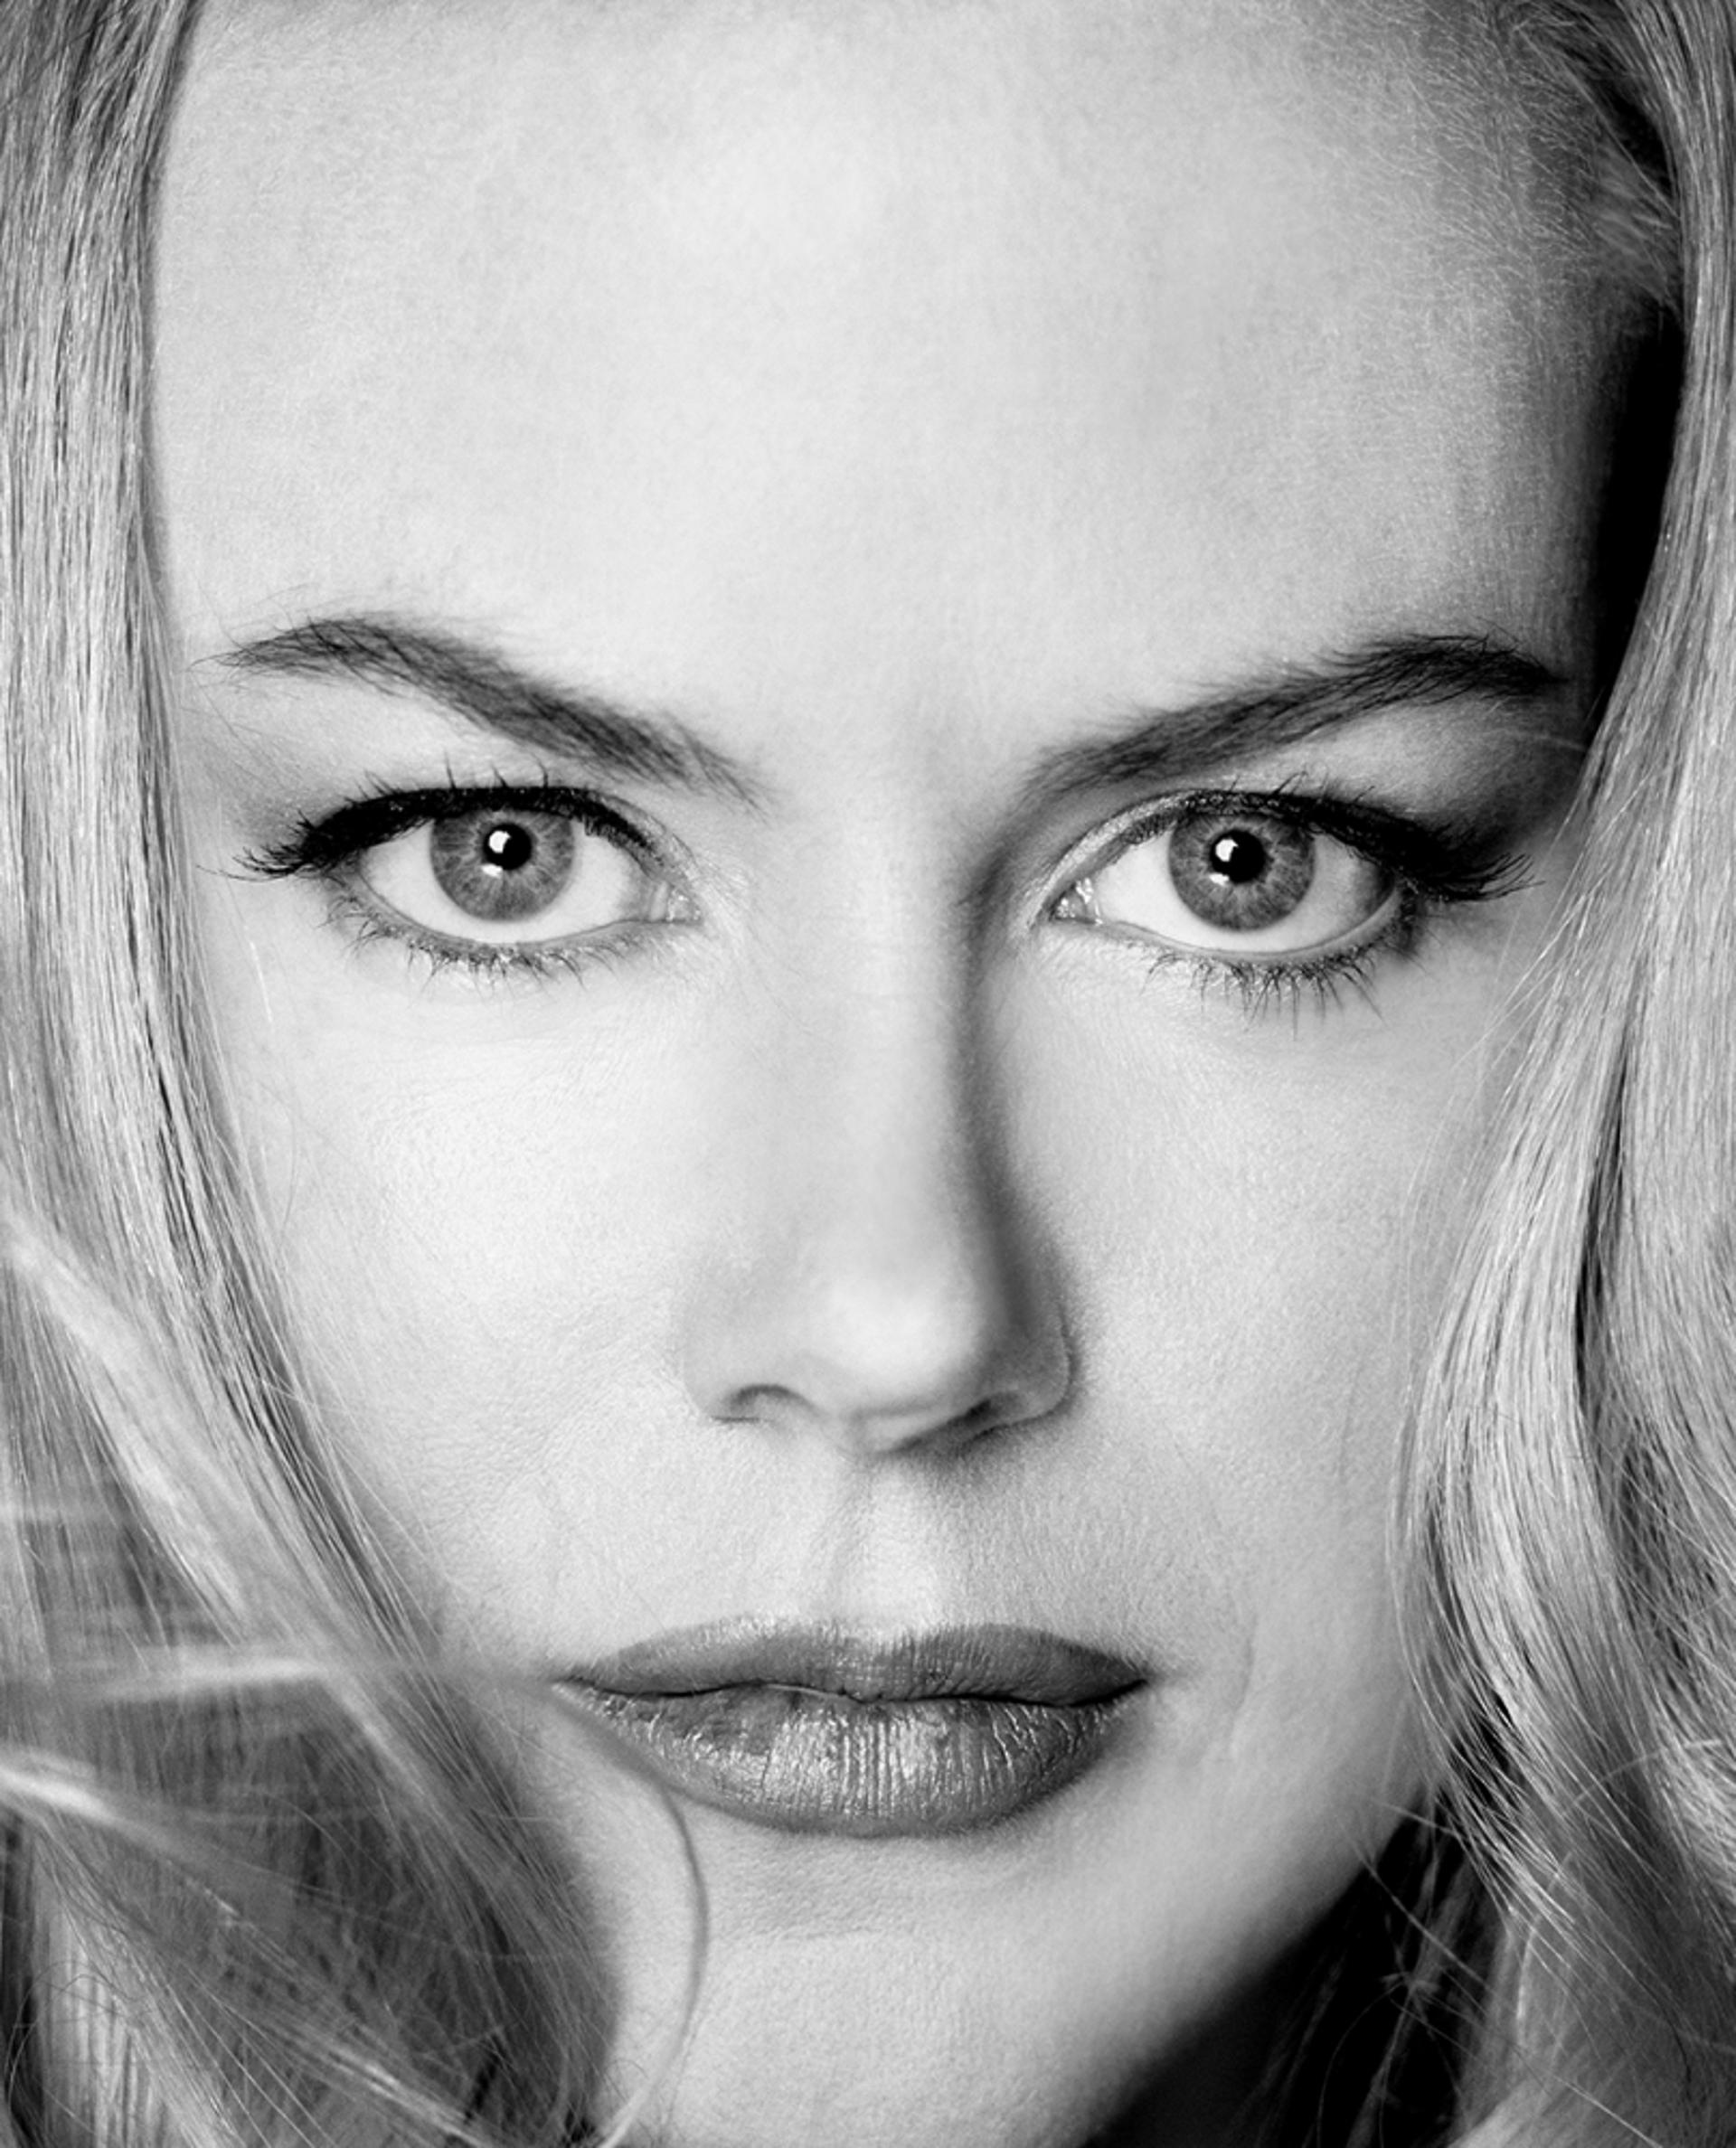 03077 Nicole Kidman Headshot BW by Timothy White